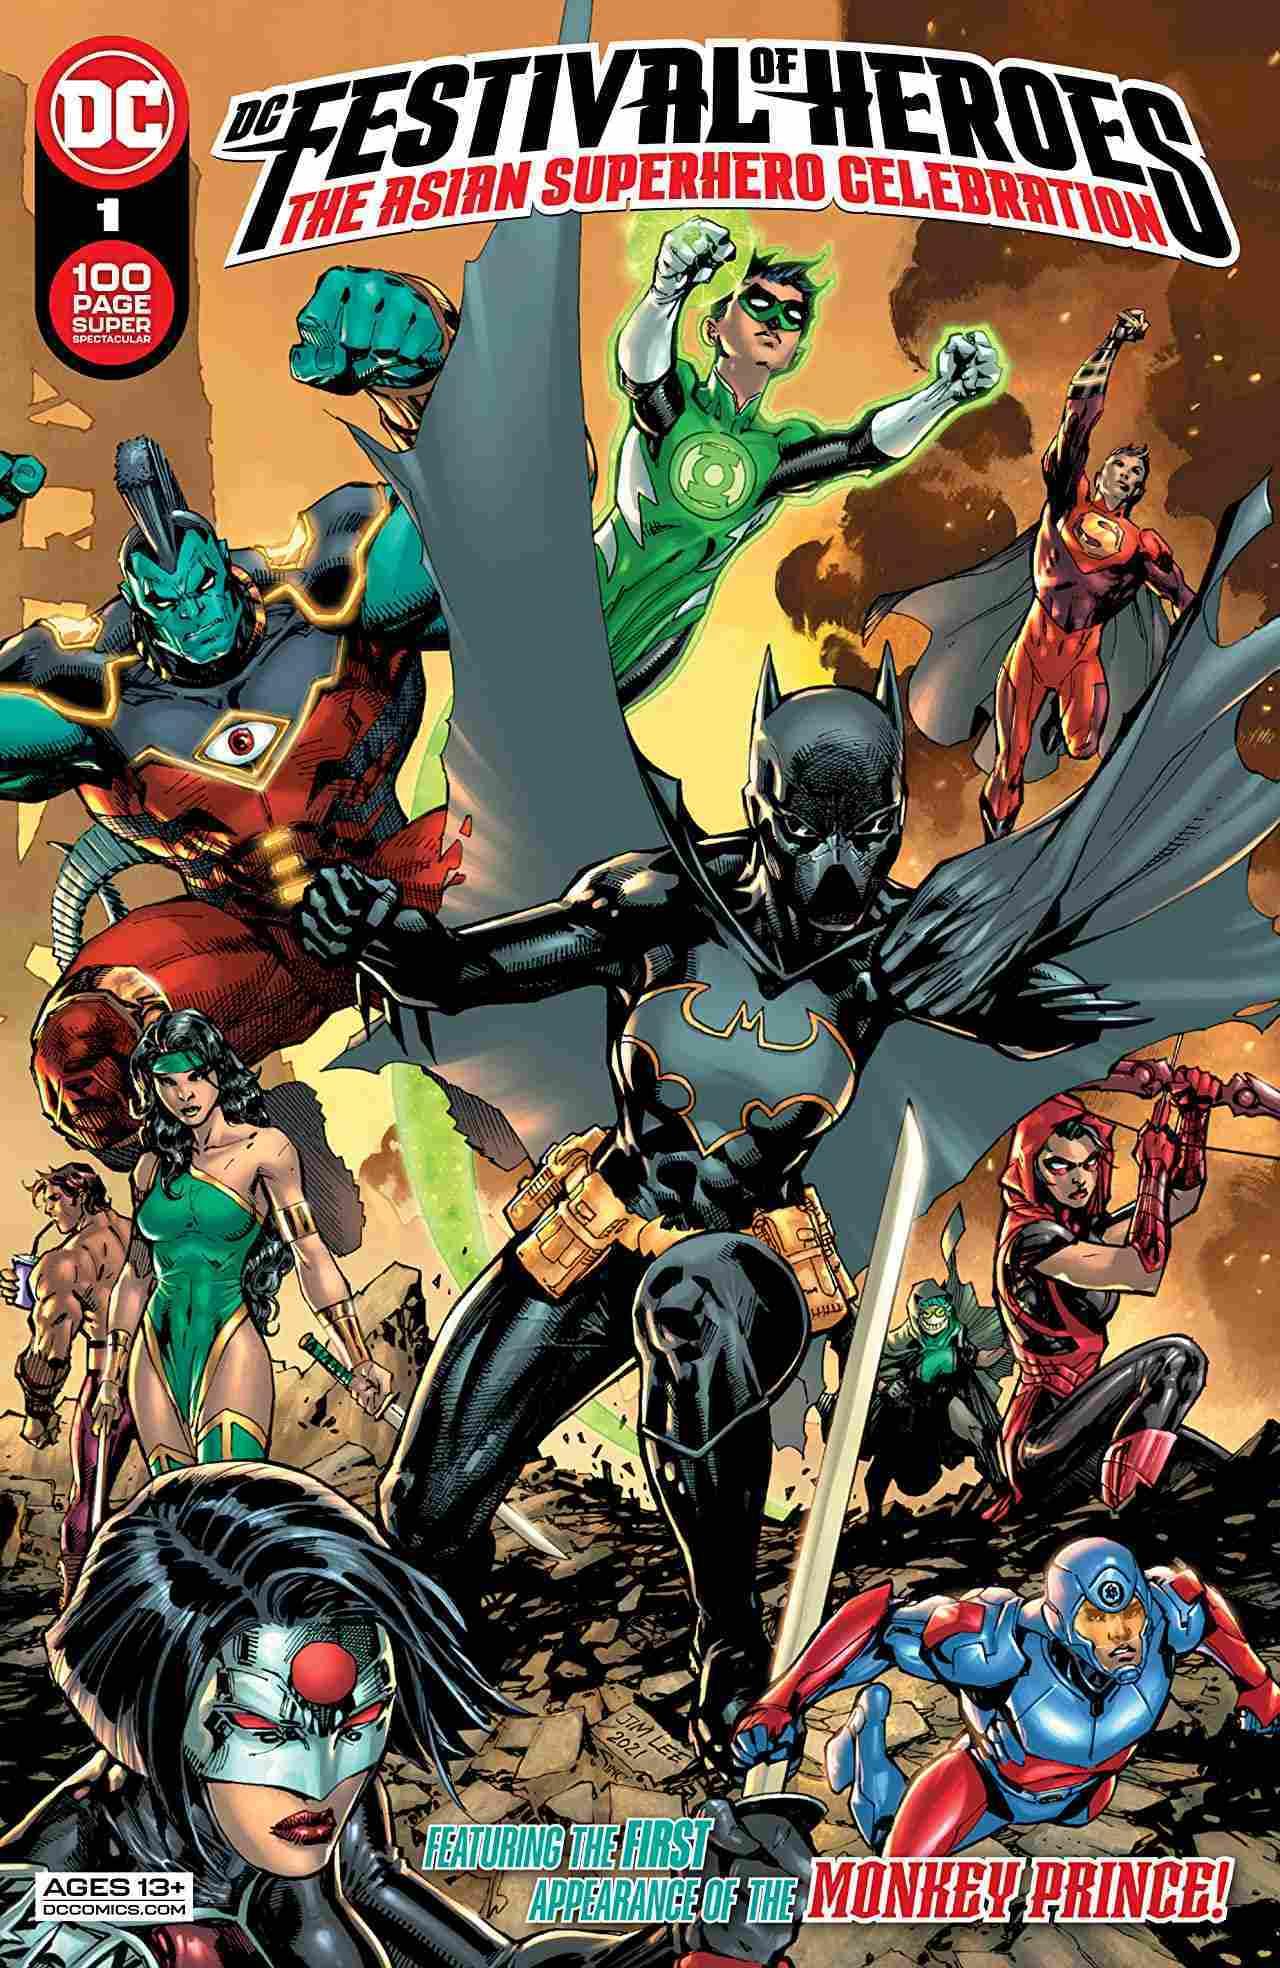 DC Festival of Heroes The Asian Superhero Celebration #1